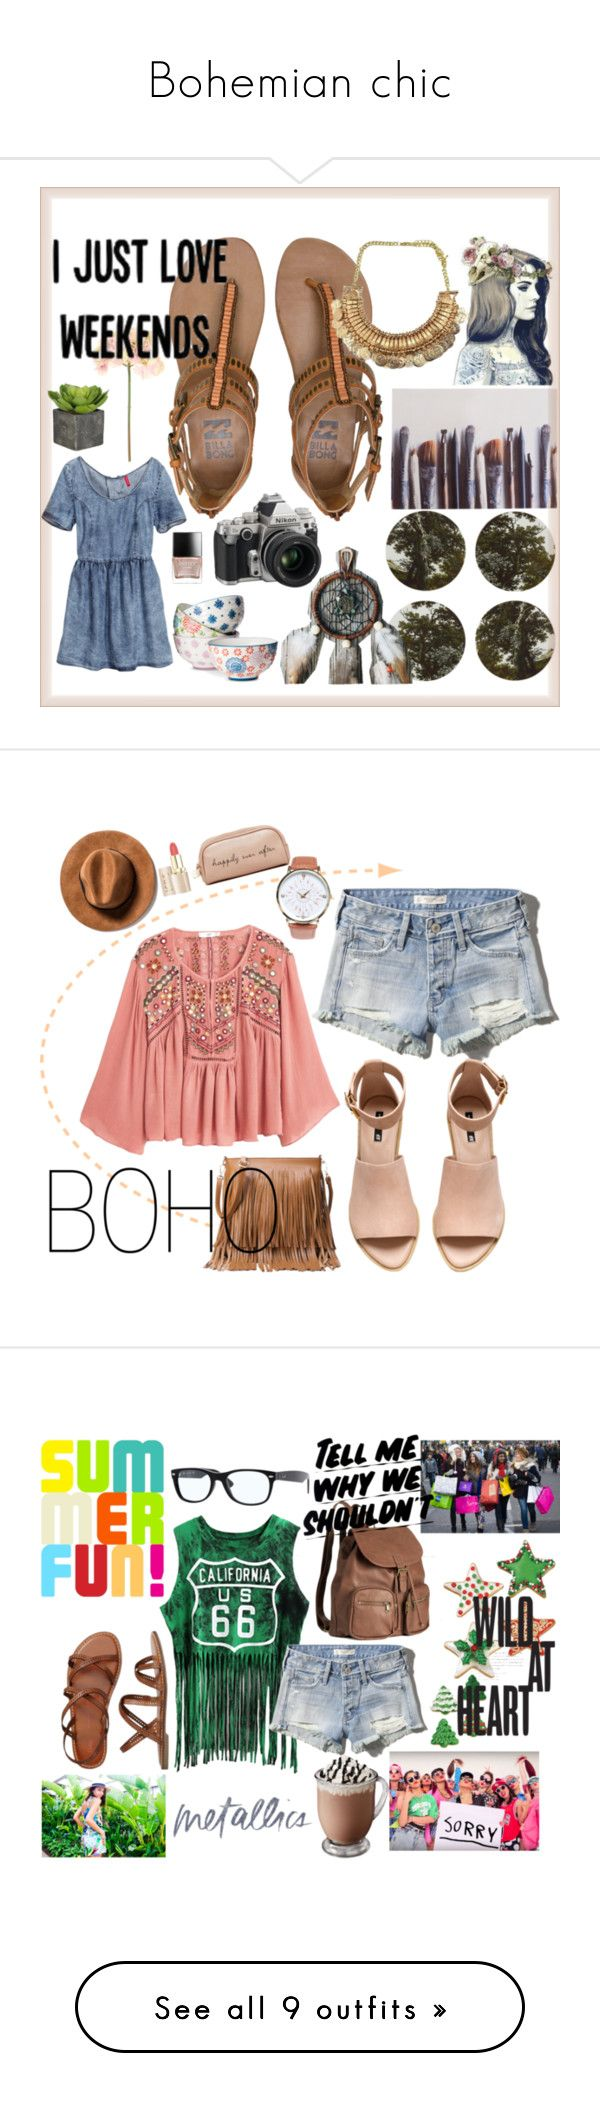 Bohemian chic by camilazeballo on Polyvore featuring moda, Boho & Co, Ella Doran, Billabong, H&M, Nikon, Boho Boutique, Sia, Butter London and MANGO